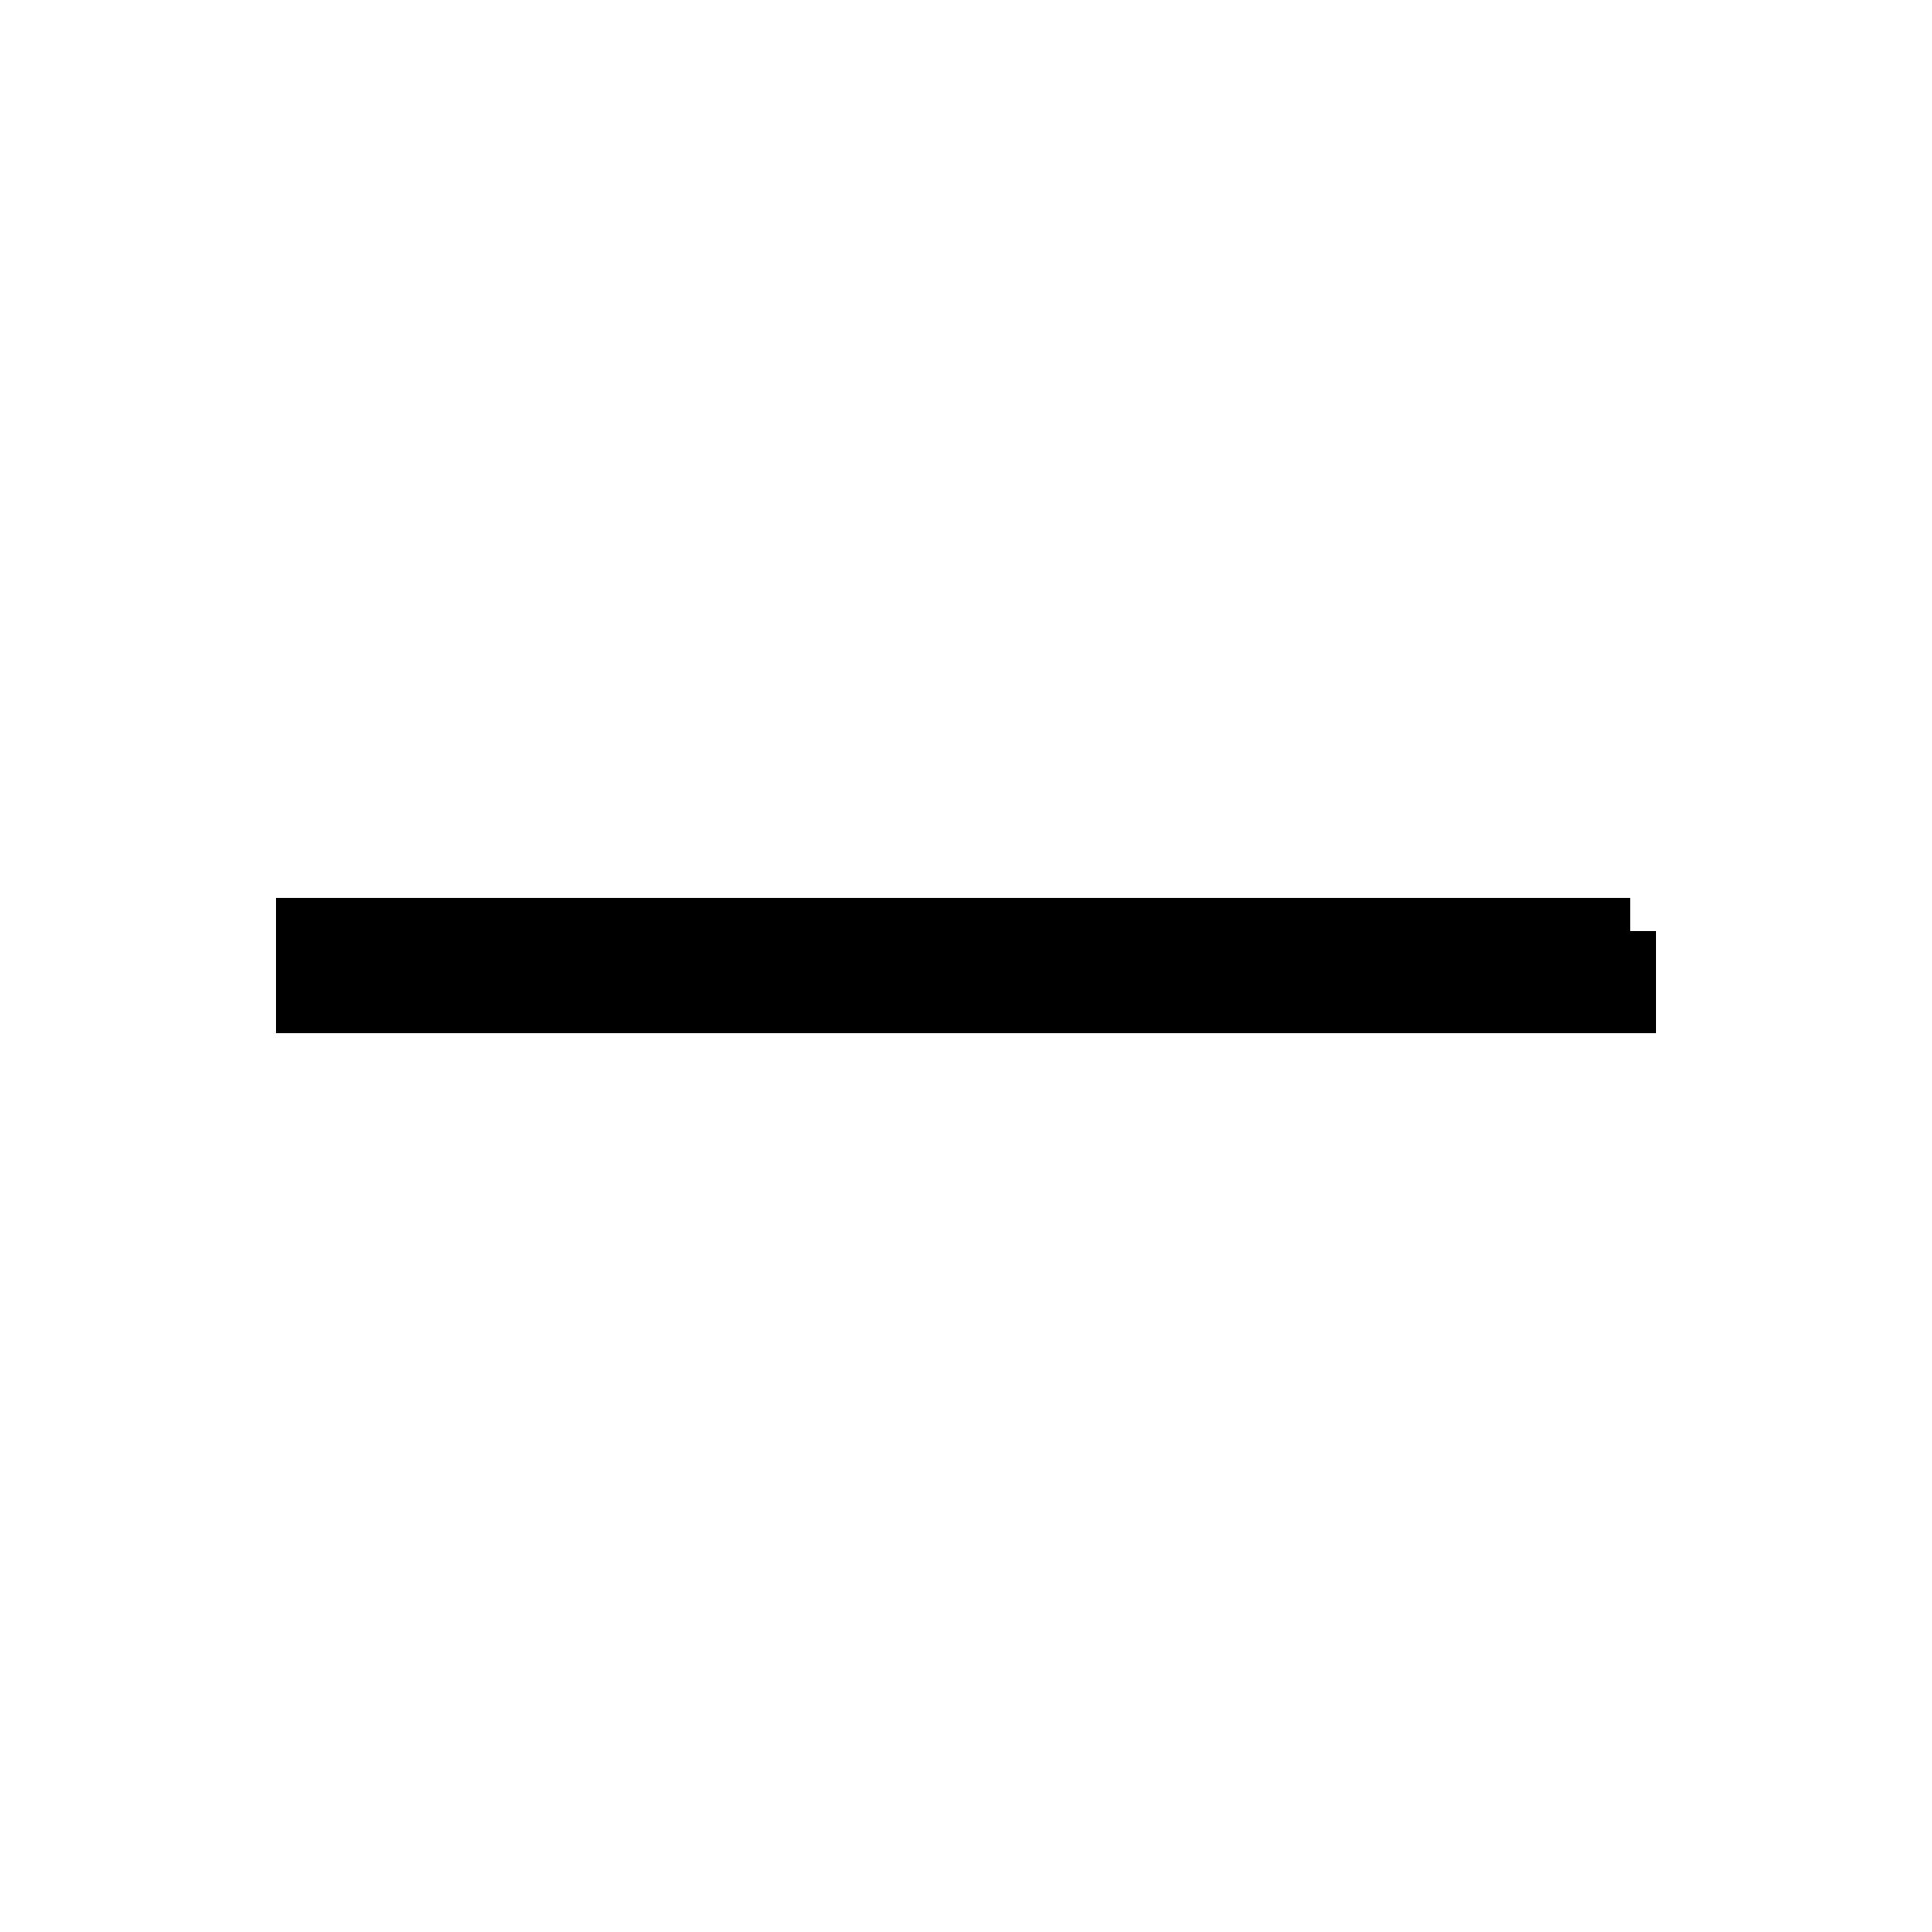 Orthografica